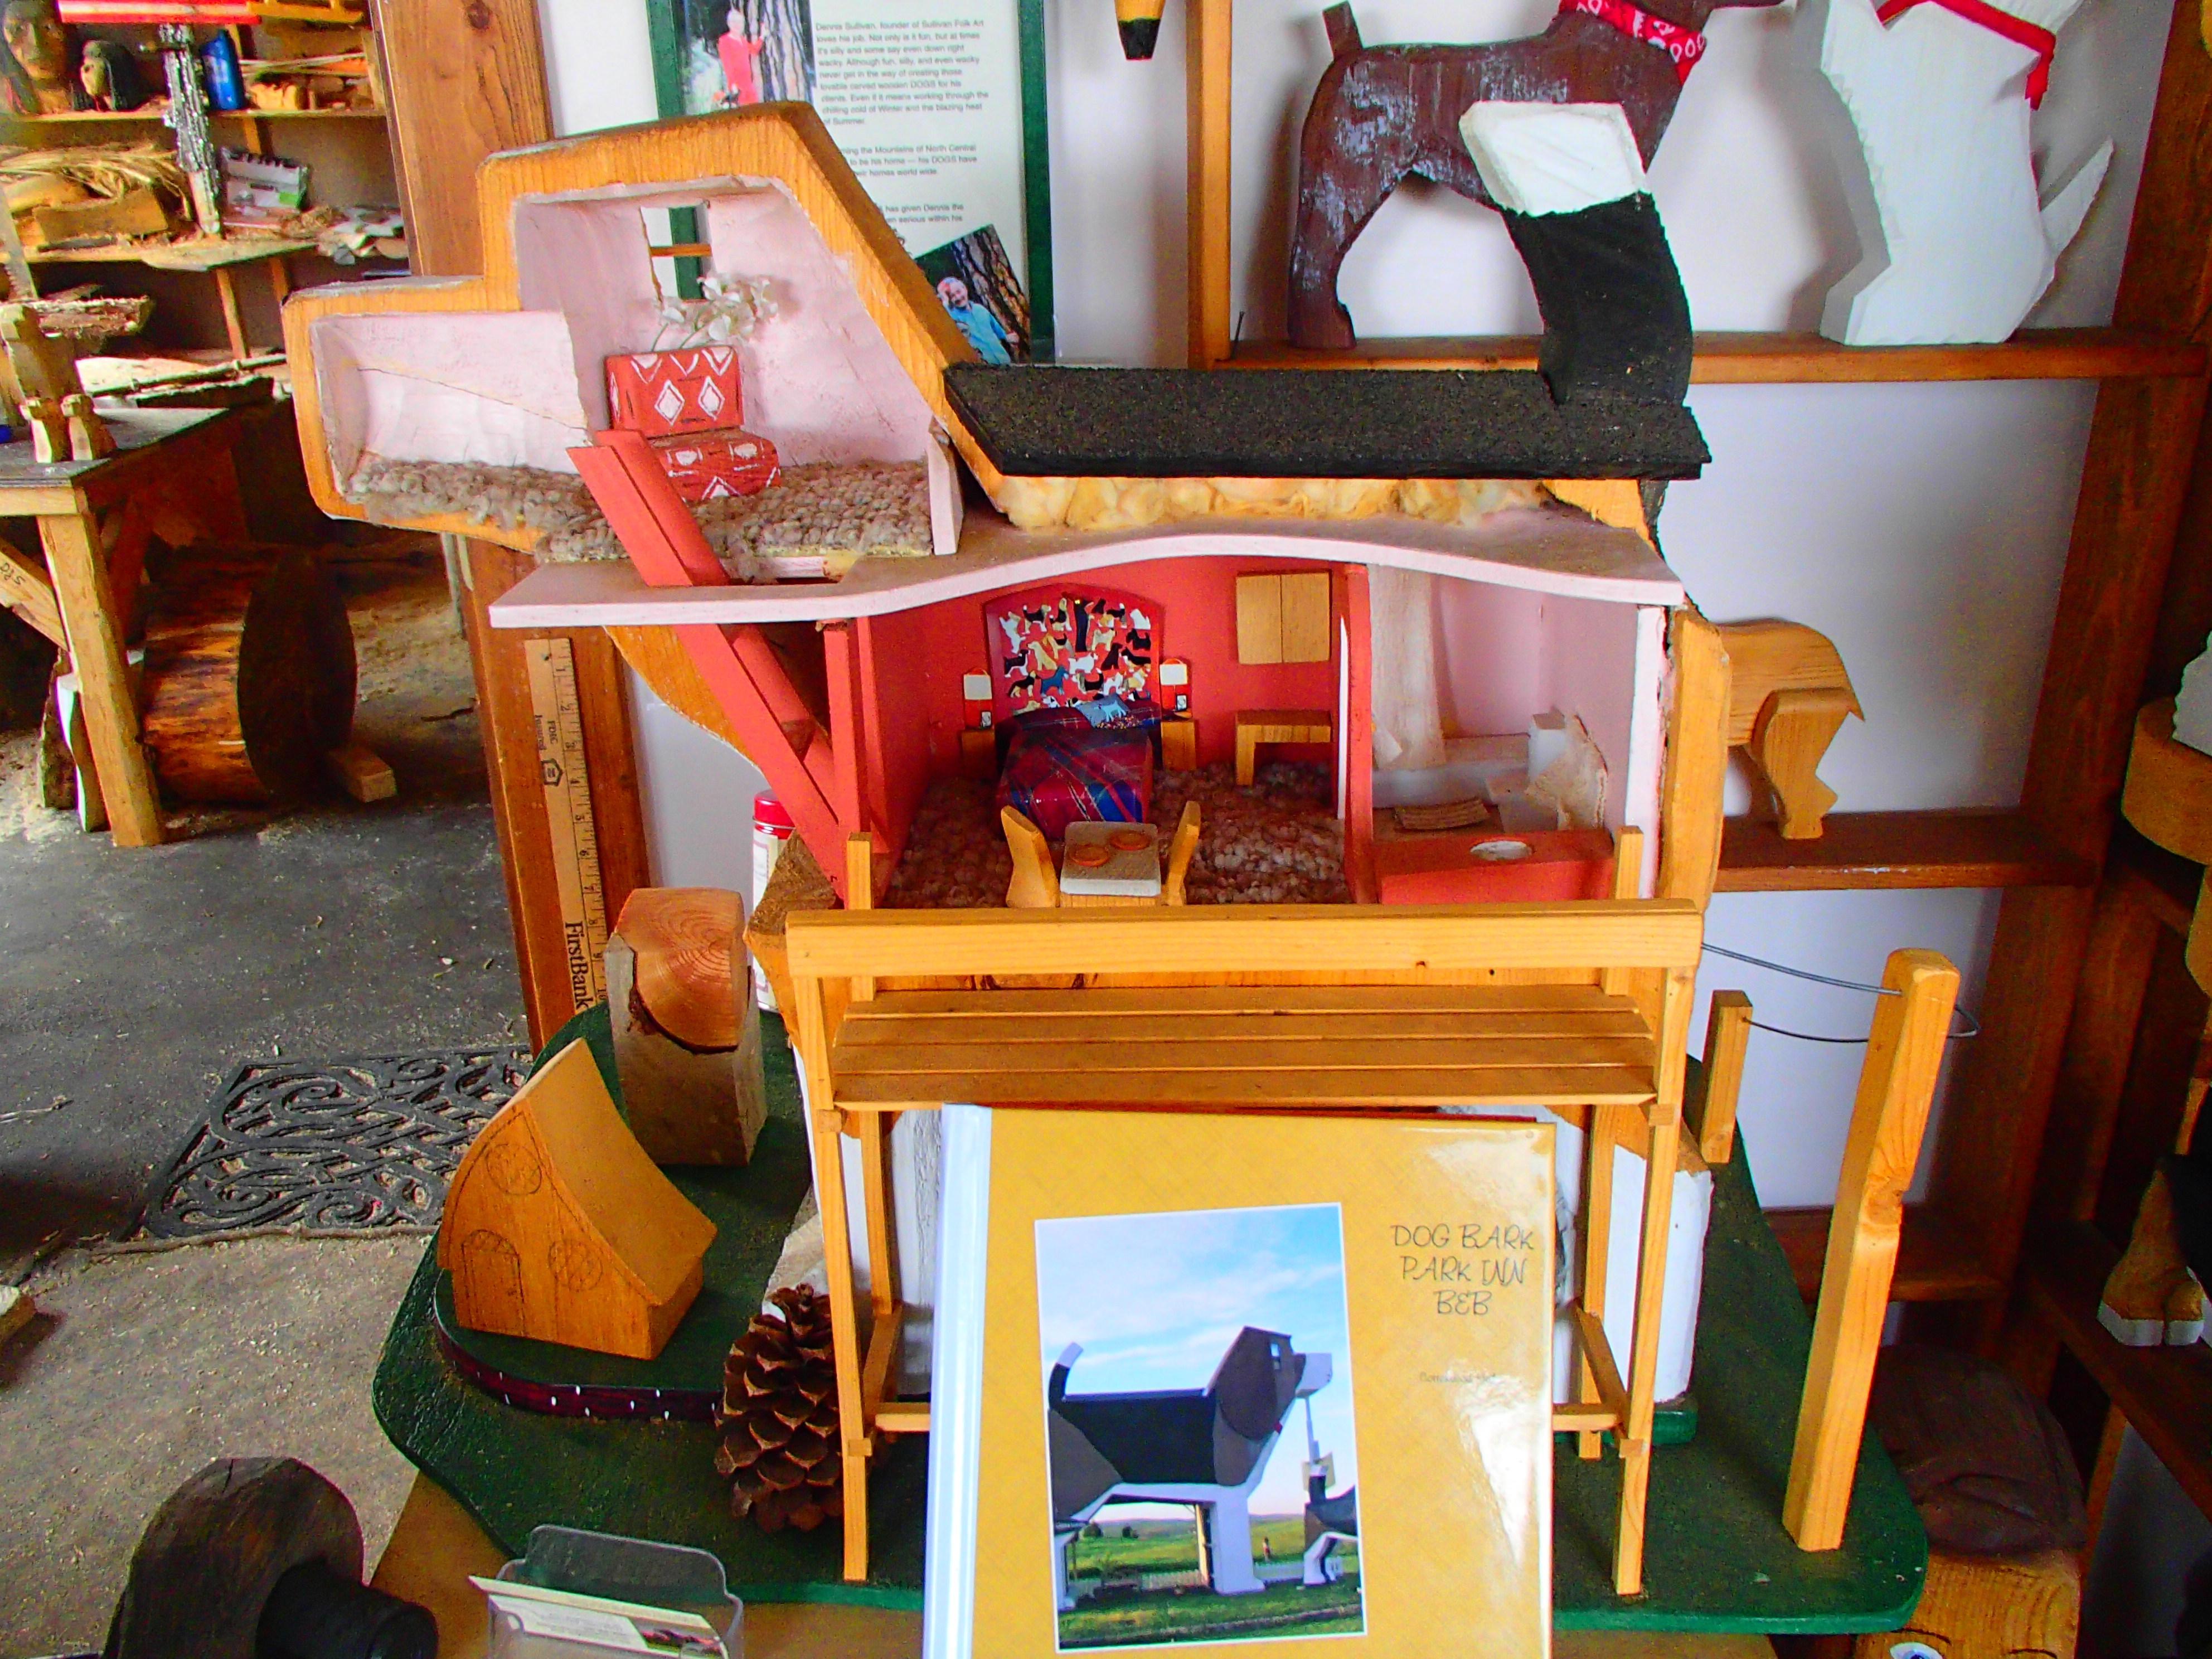 OLYMPUS DIGITAL CAMERA. The Artists Who Run The Dog Bark Park Inn ...